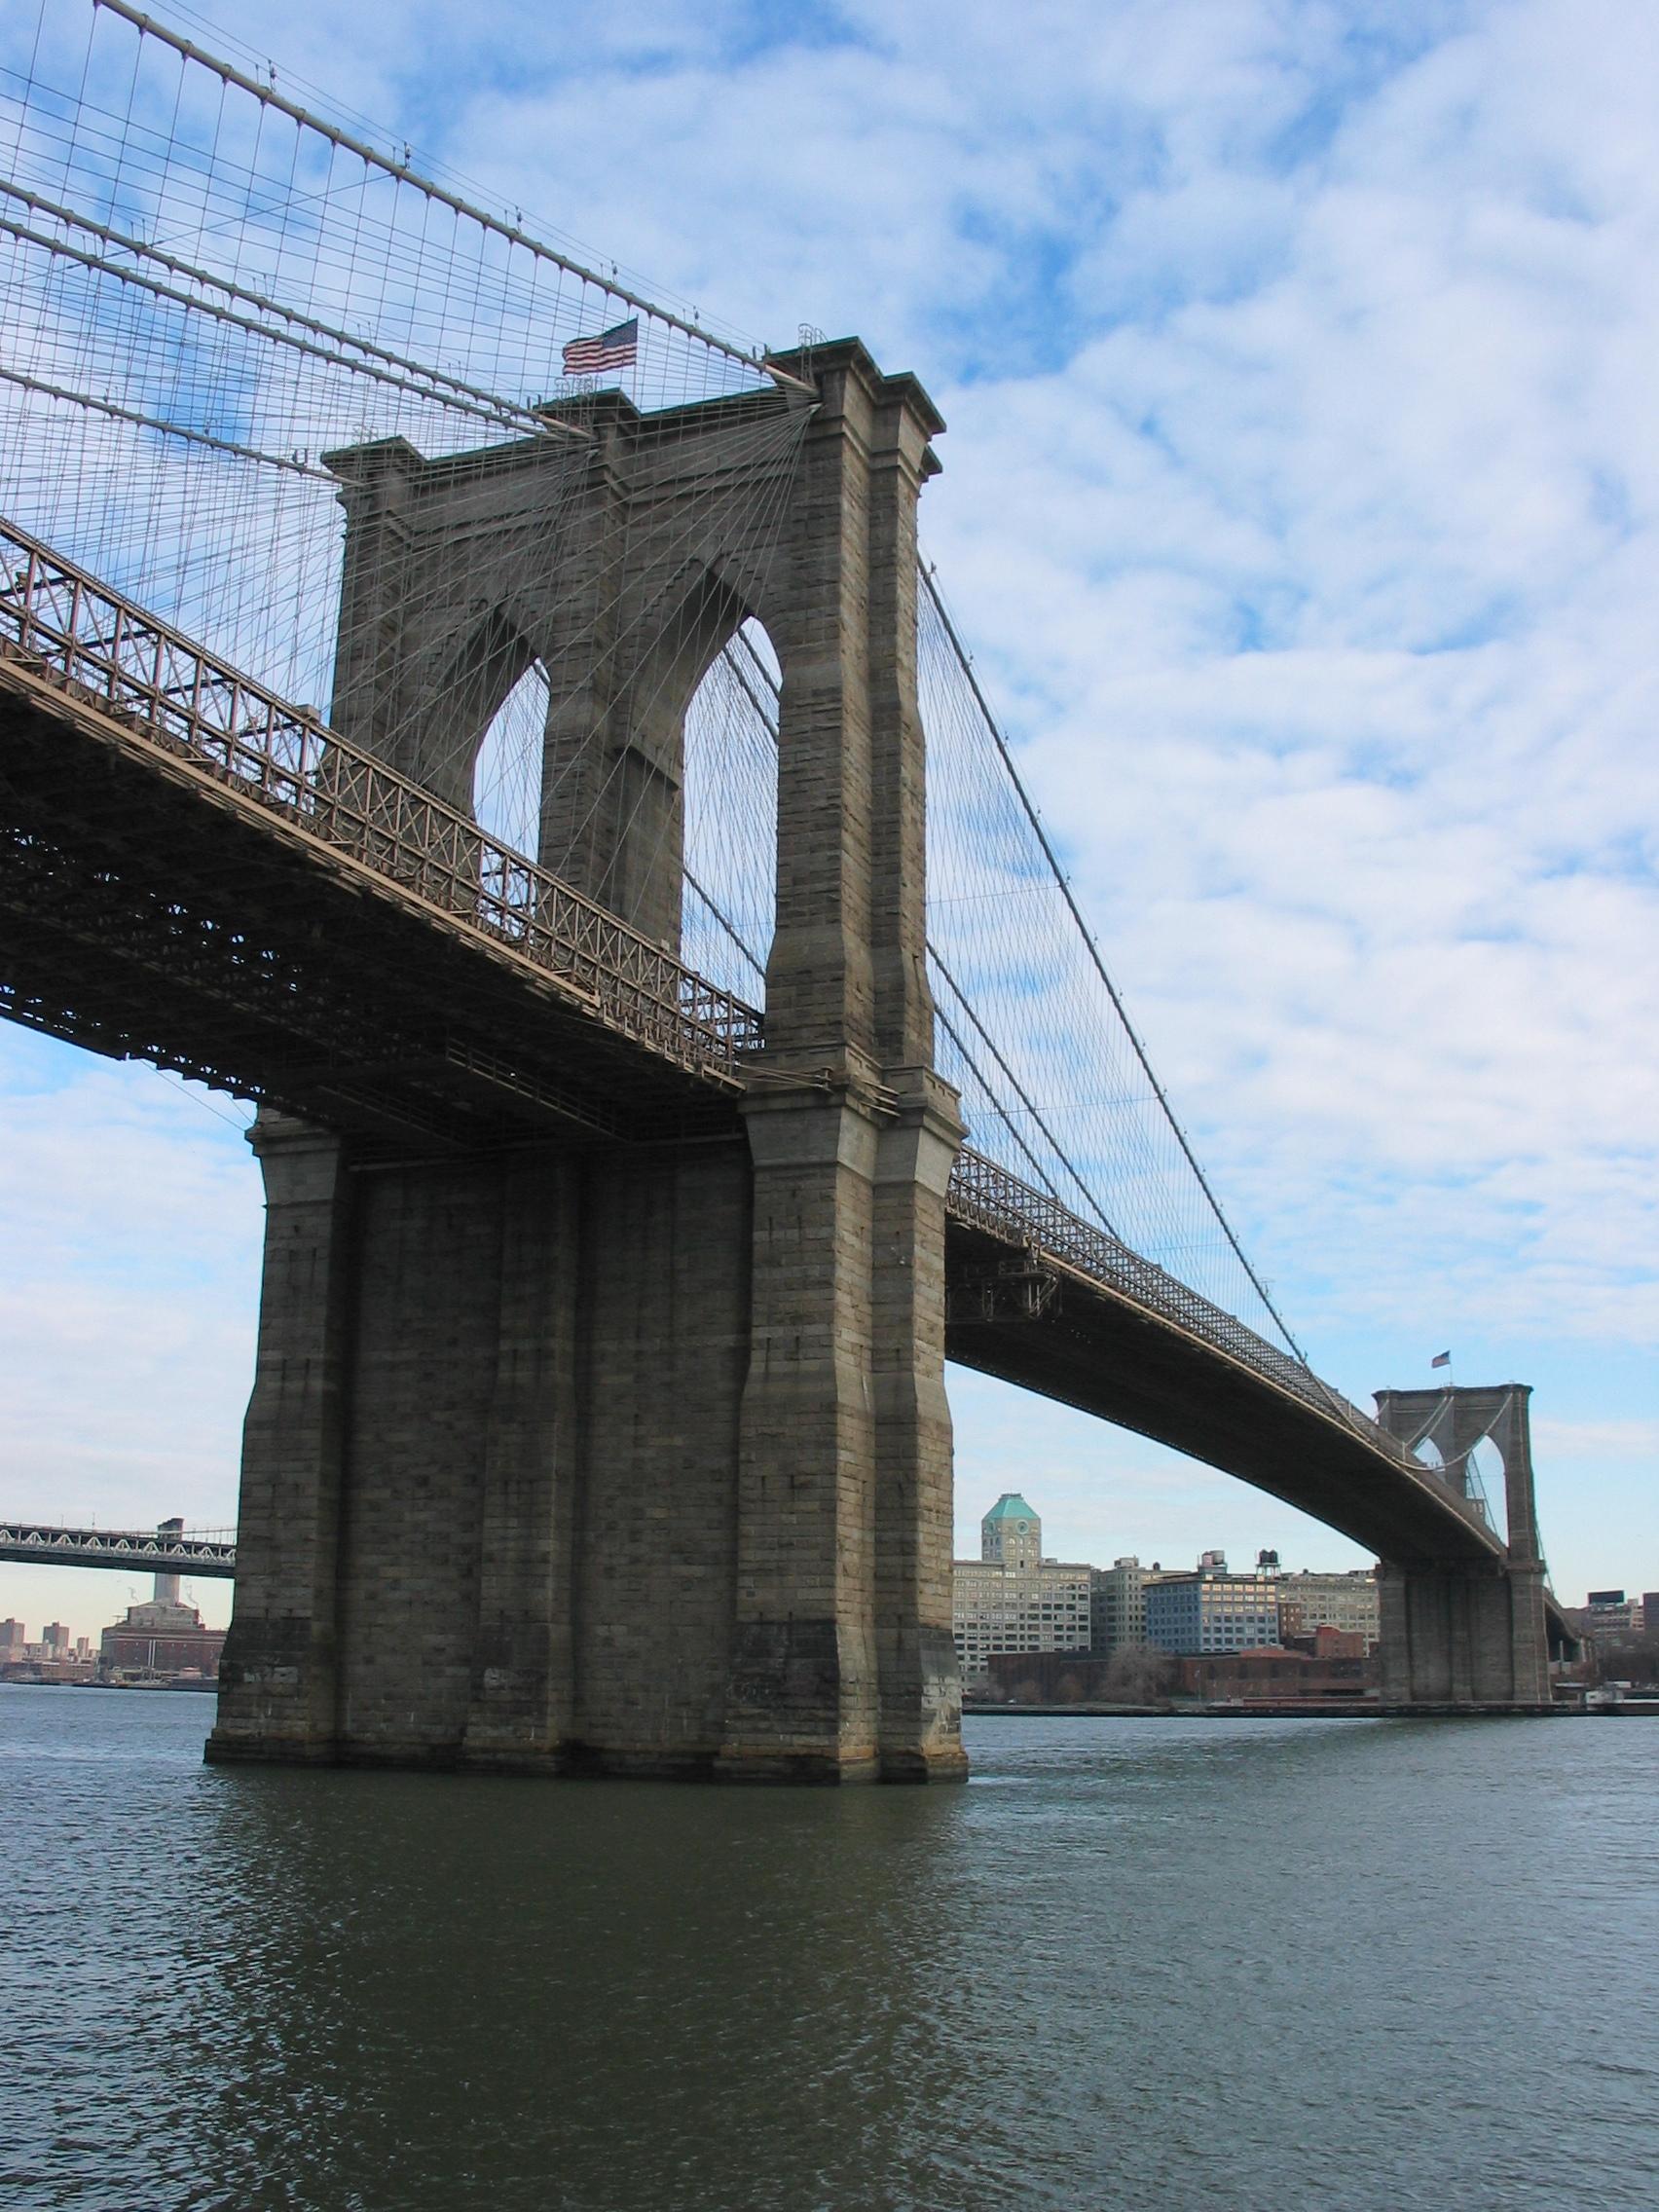 brooklyn bridge cloverfield wiki cloverfield monster slusho j j abrams. Black Bedroom Furniture Sets. Home Design Ideas